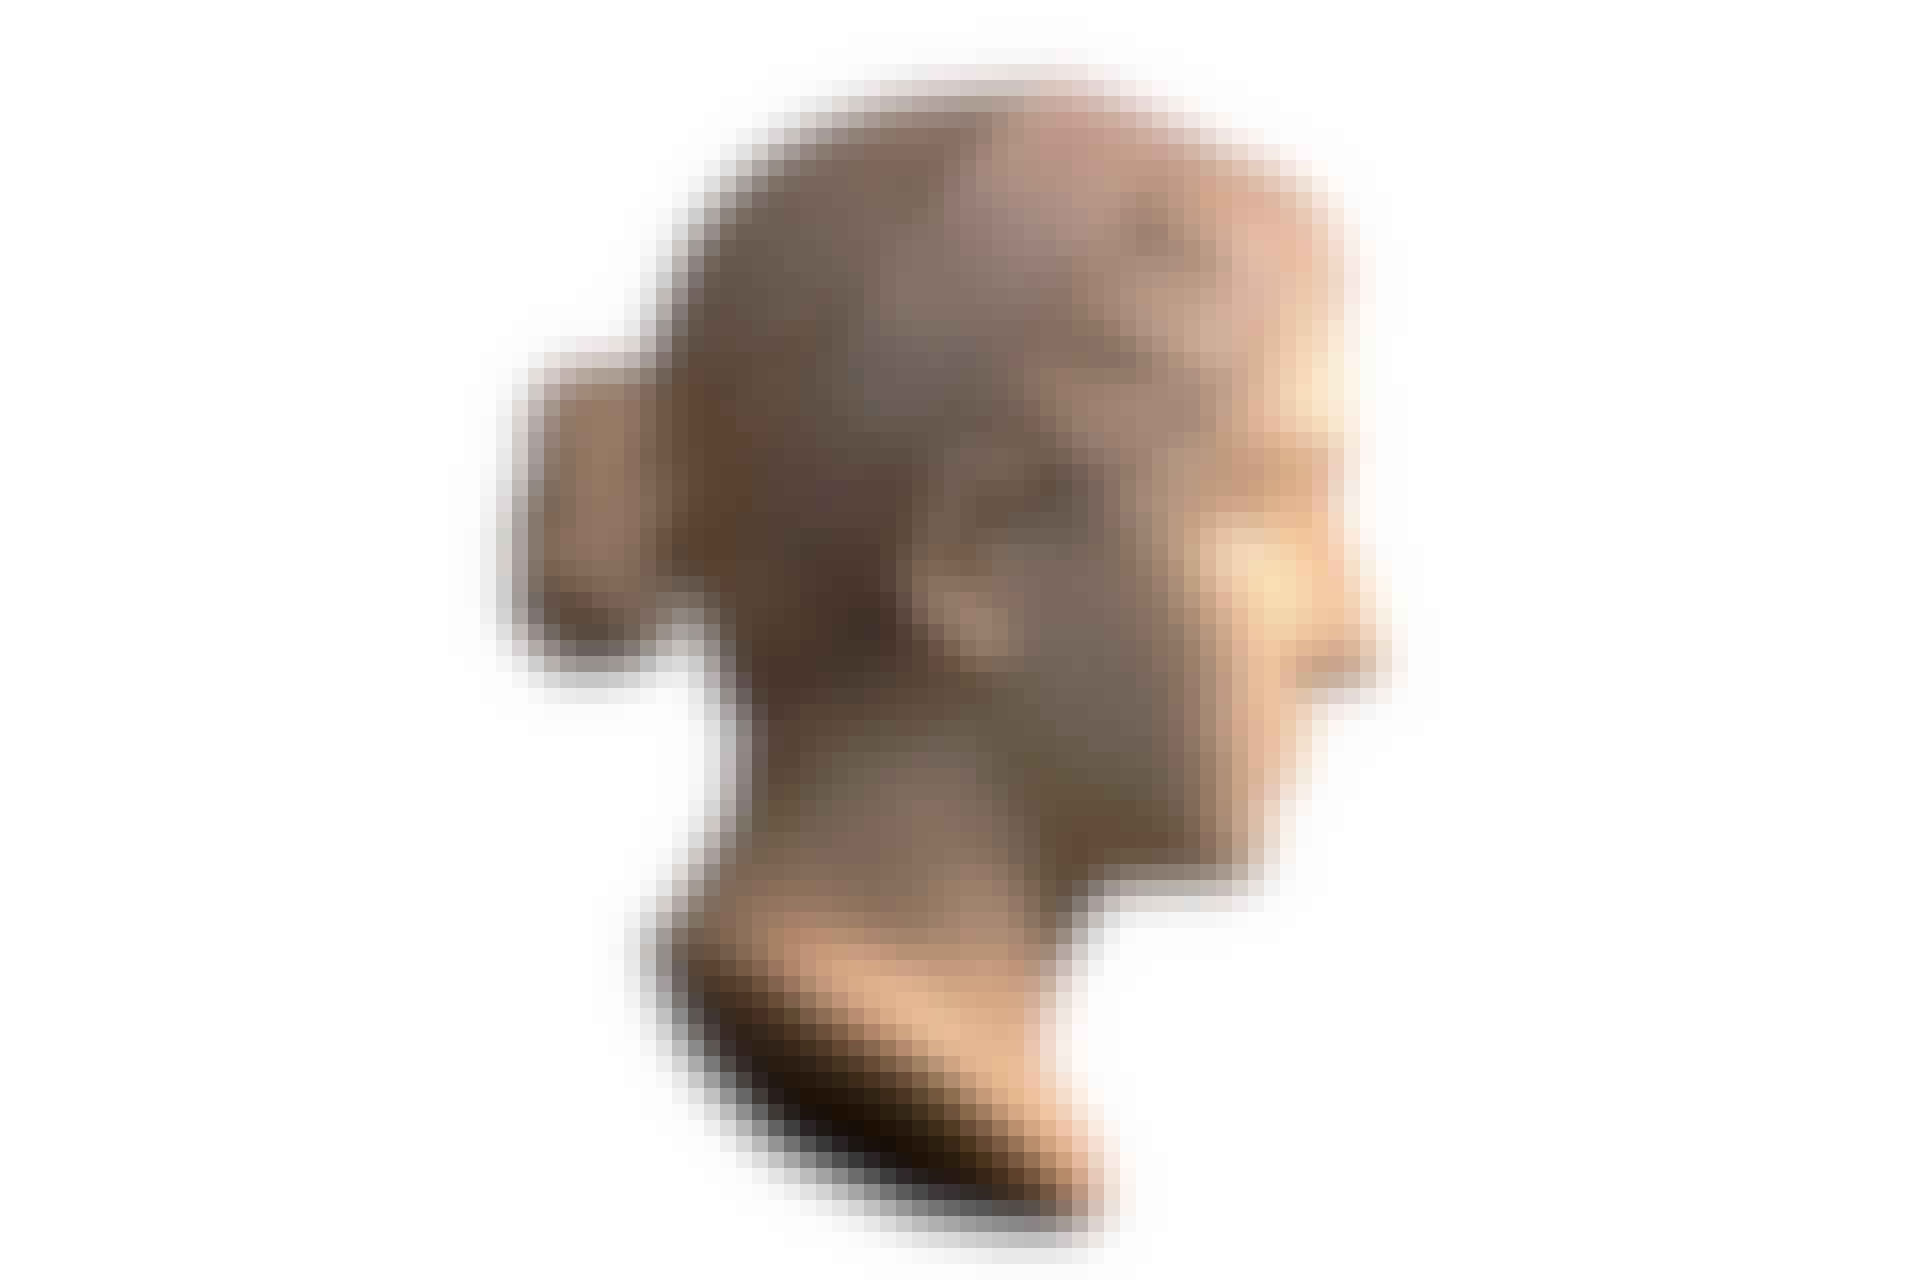 Cleopatra Statue